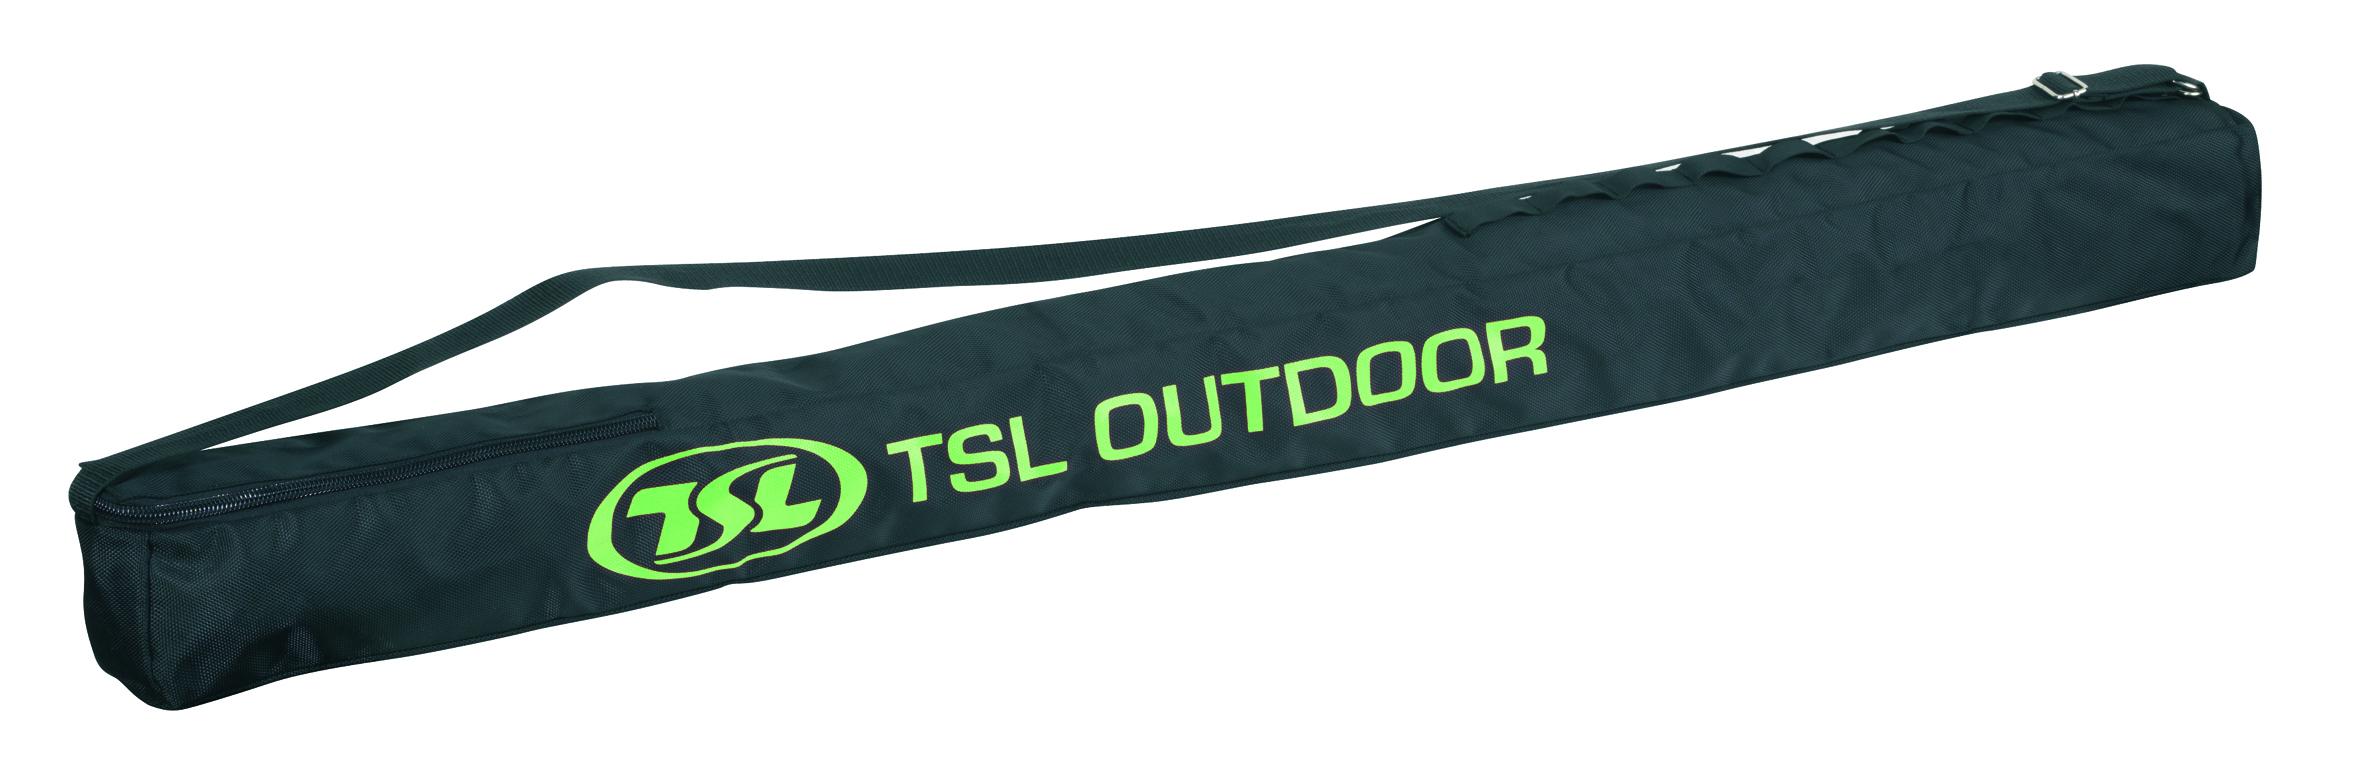 TSL Outdoor - Pole Bag - 2 pairs